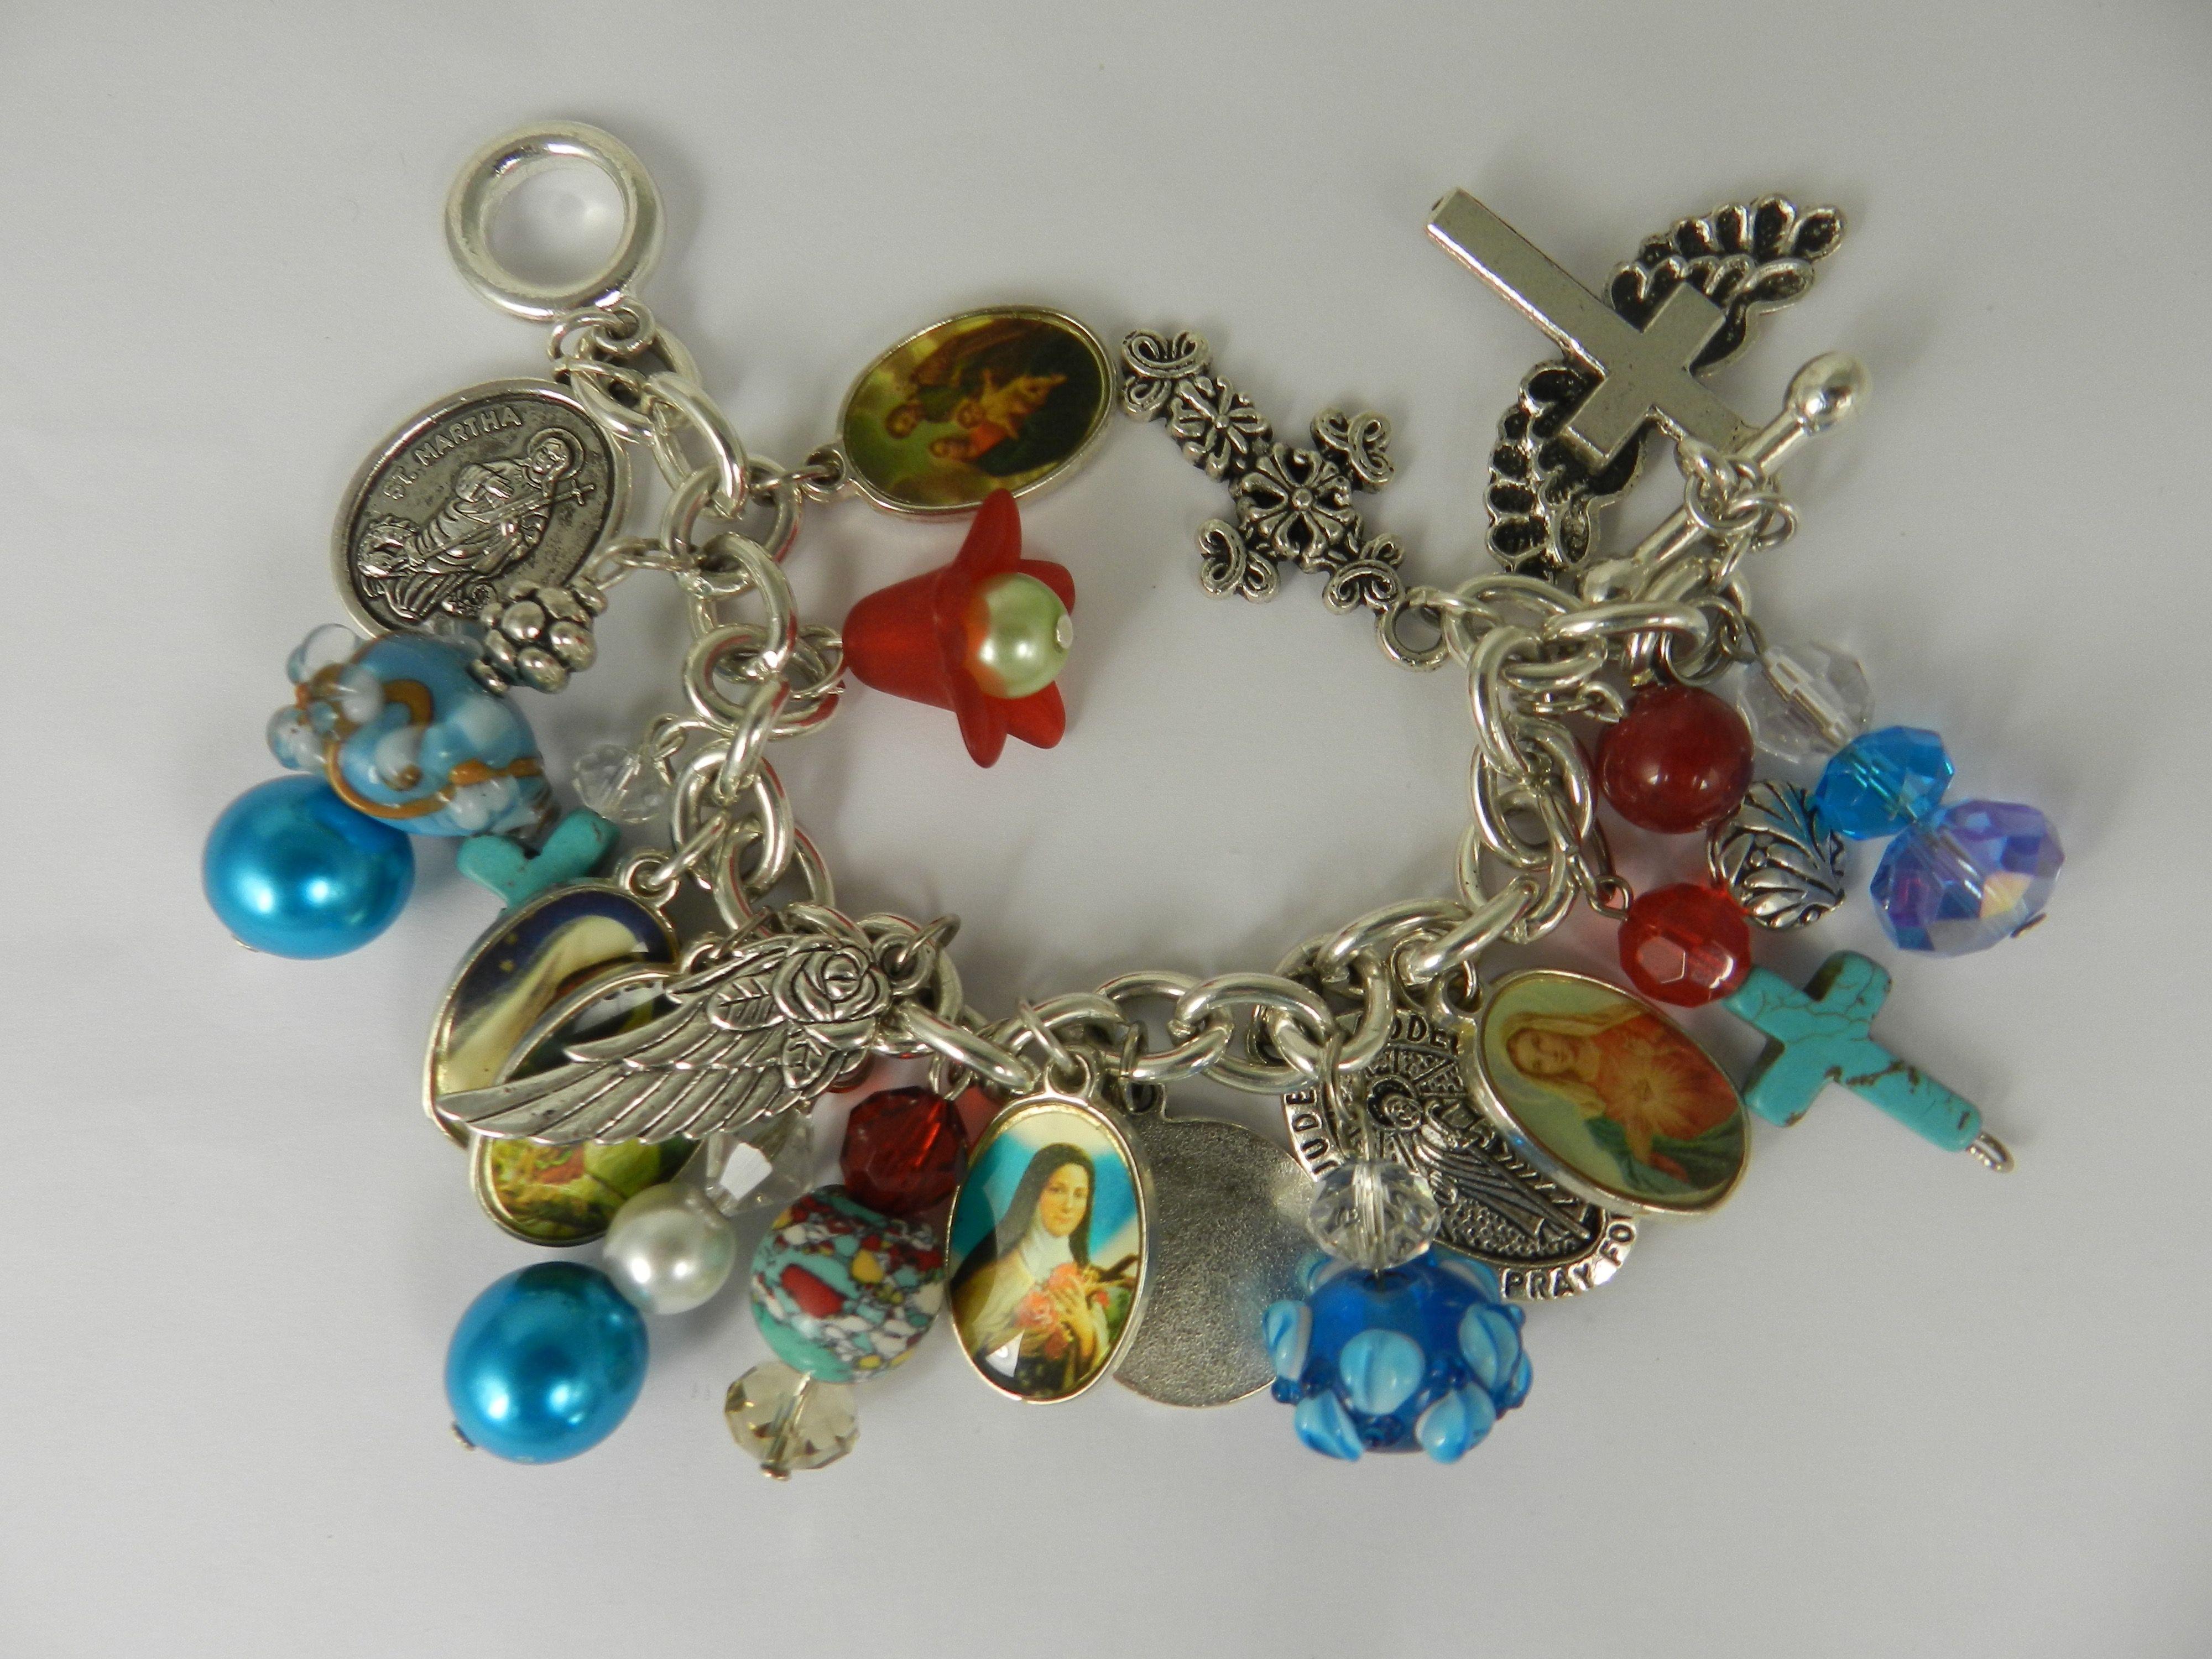 Christian charm bracelet catholic holy medals saint virgin mary